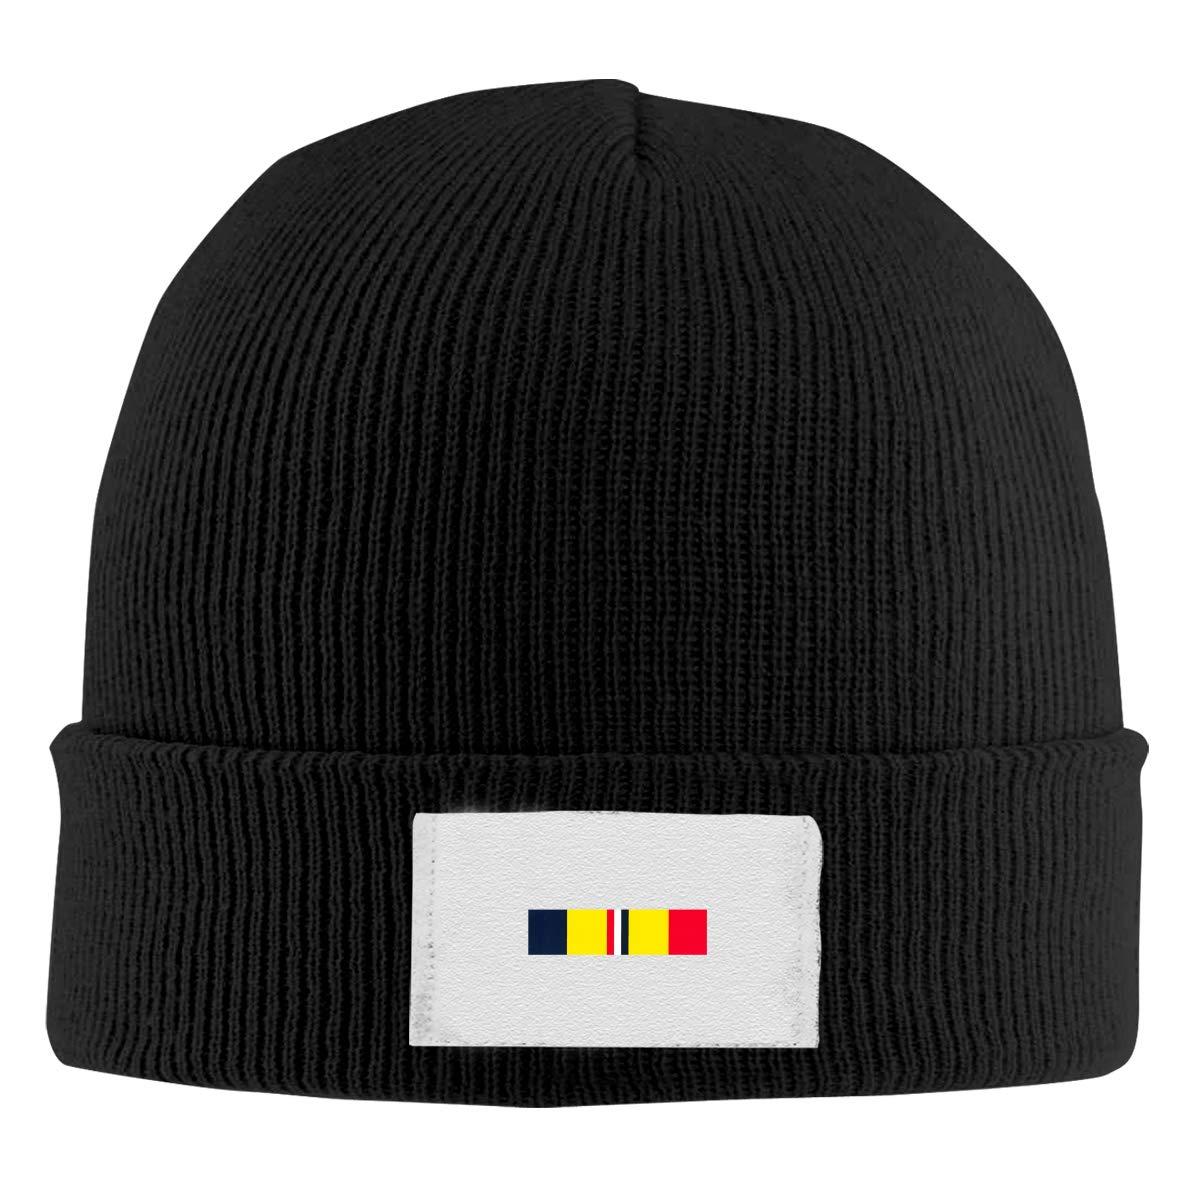 Dunpaiaa Skull Caps Combat Action Ribbon Logo Winter Warm Knit Hats Stretchy Cuff Beanie Hat Black